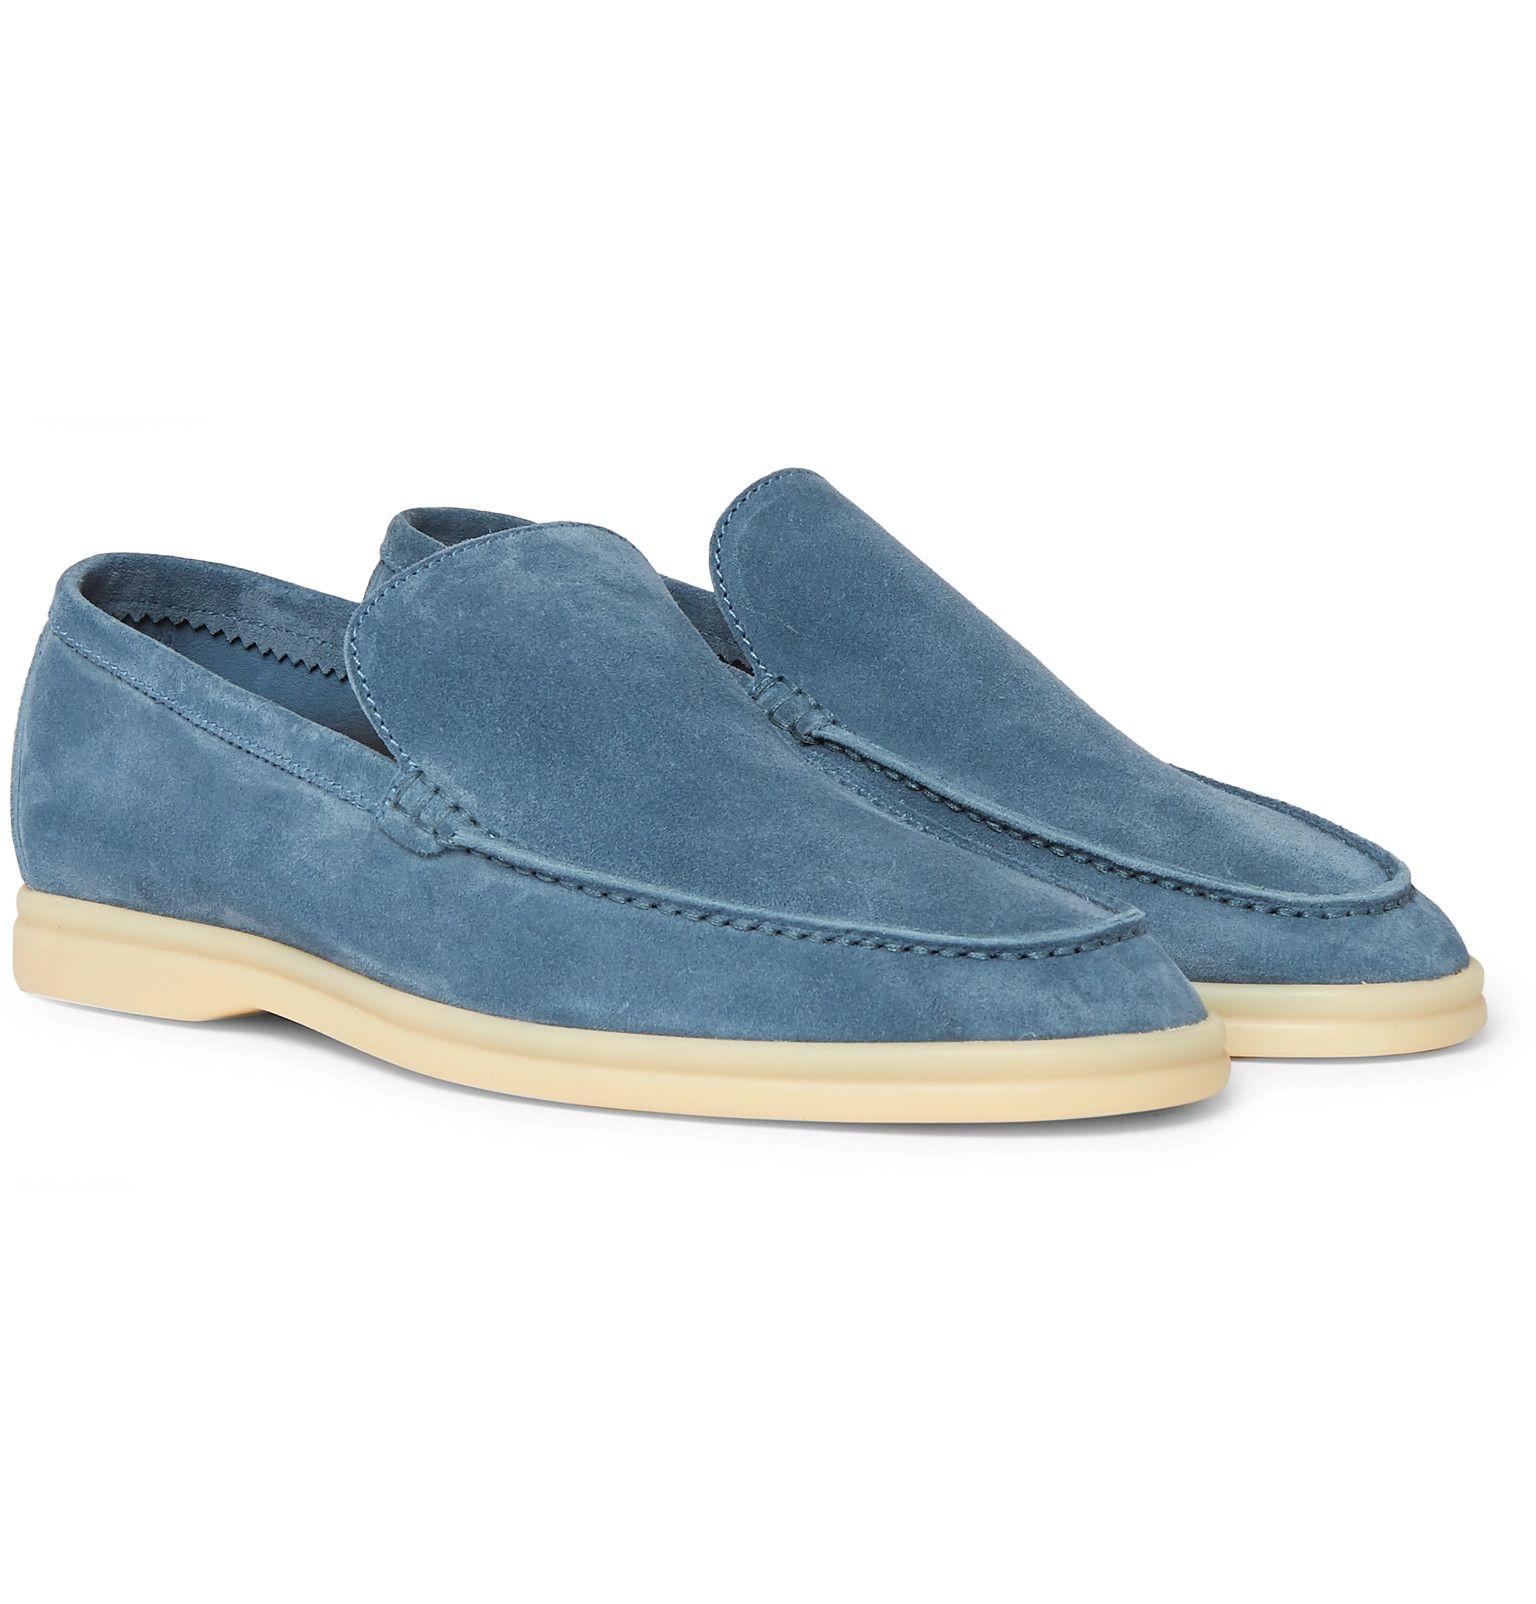 40e0481e6570f Loro Piana - Summer Walk Suede Loafers | My Style in 2019 | Suede ...